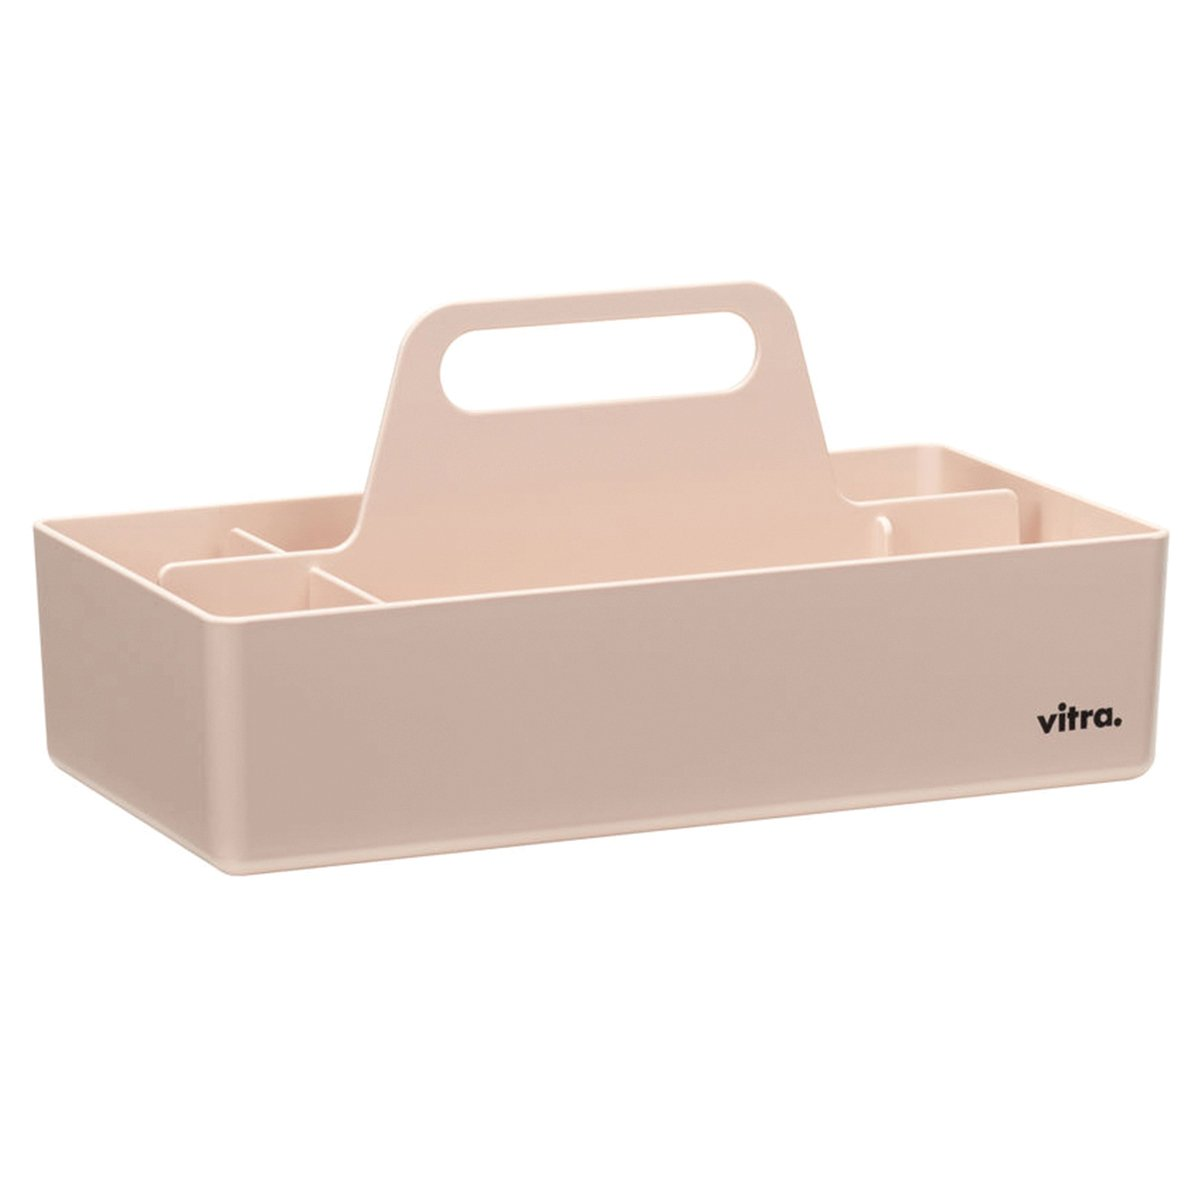 Vitra Storage Toolbox Opbergbak